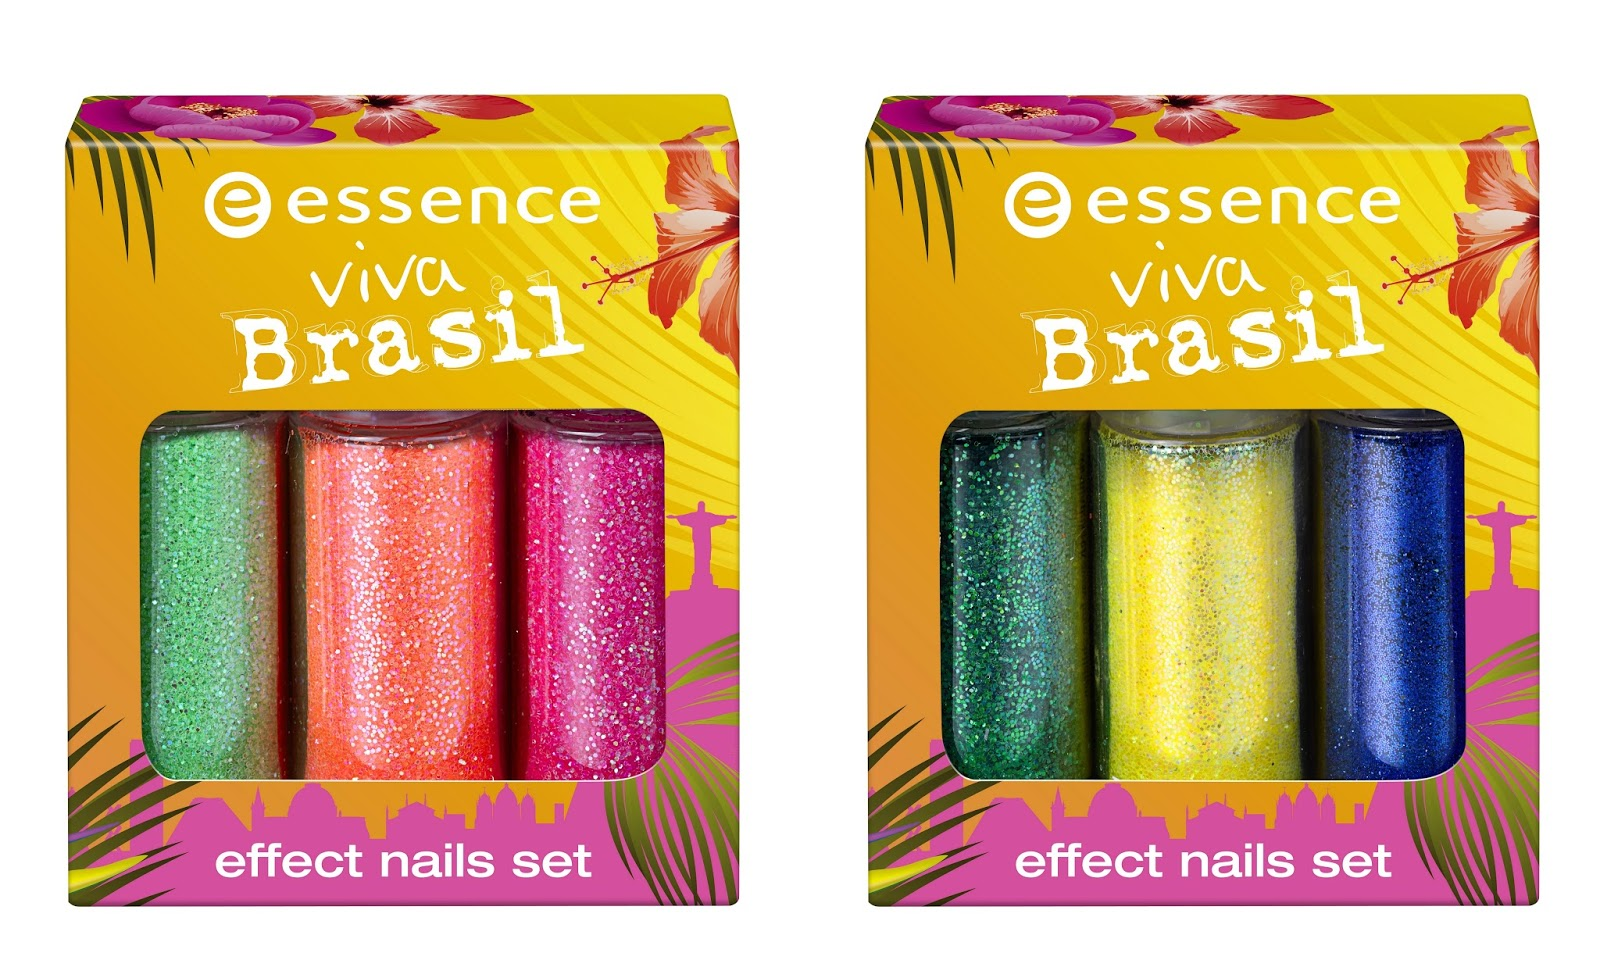 essence viva brasil – effect nails set